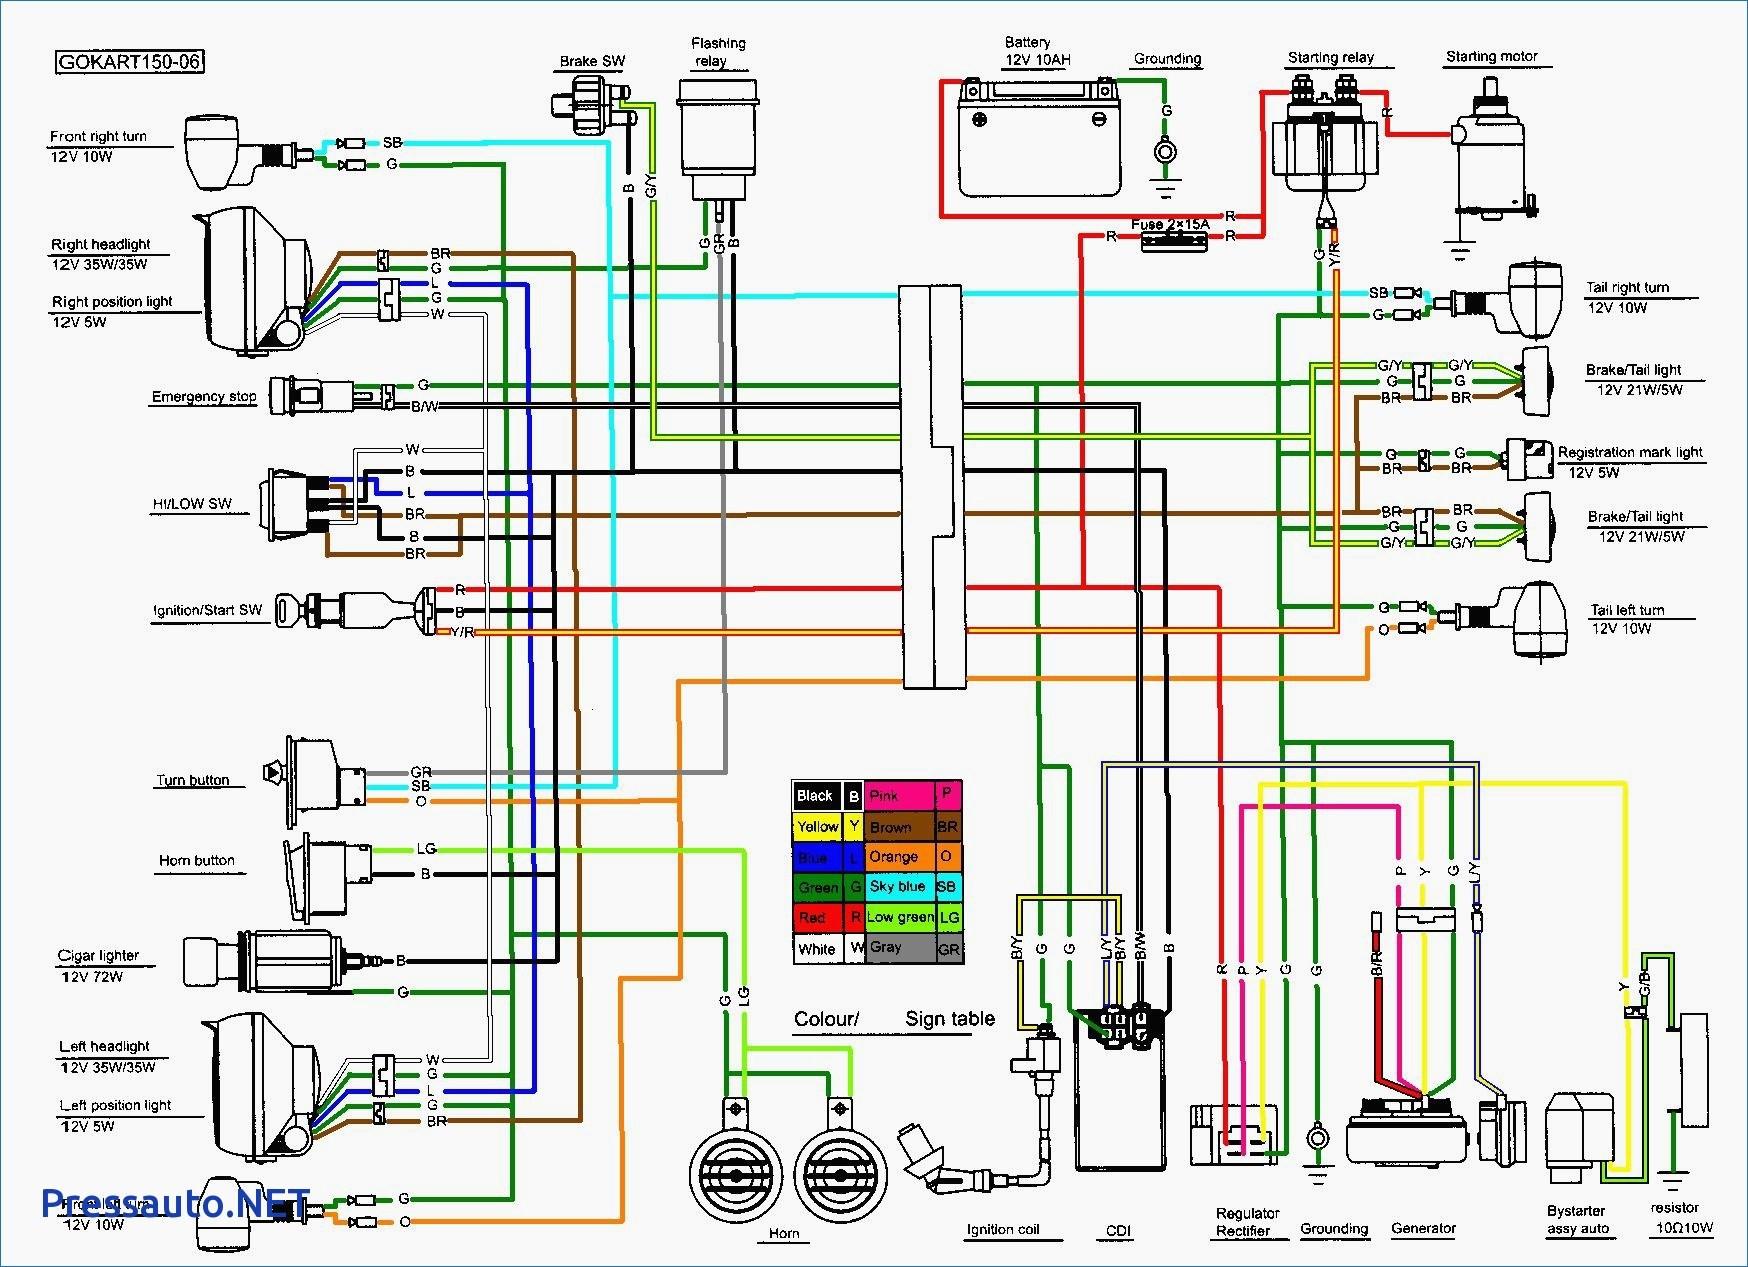 Tao 110 Atv Wiring - Wiring Diagram Detailed - Tao Tao 110 Atv Wiring Diagram